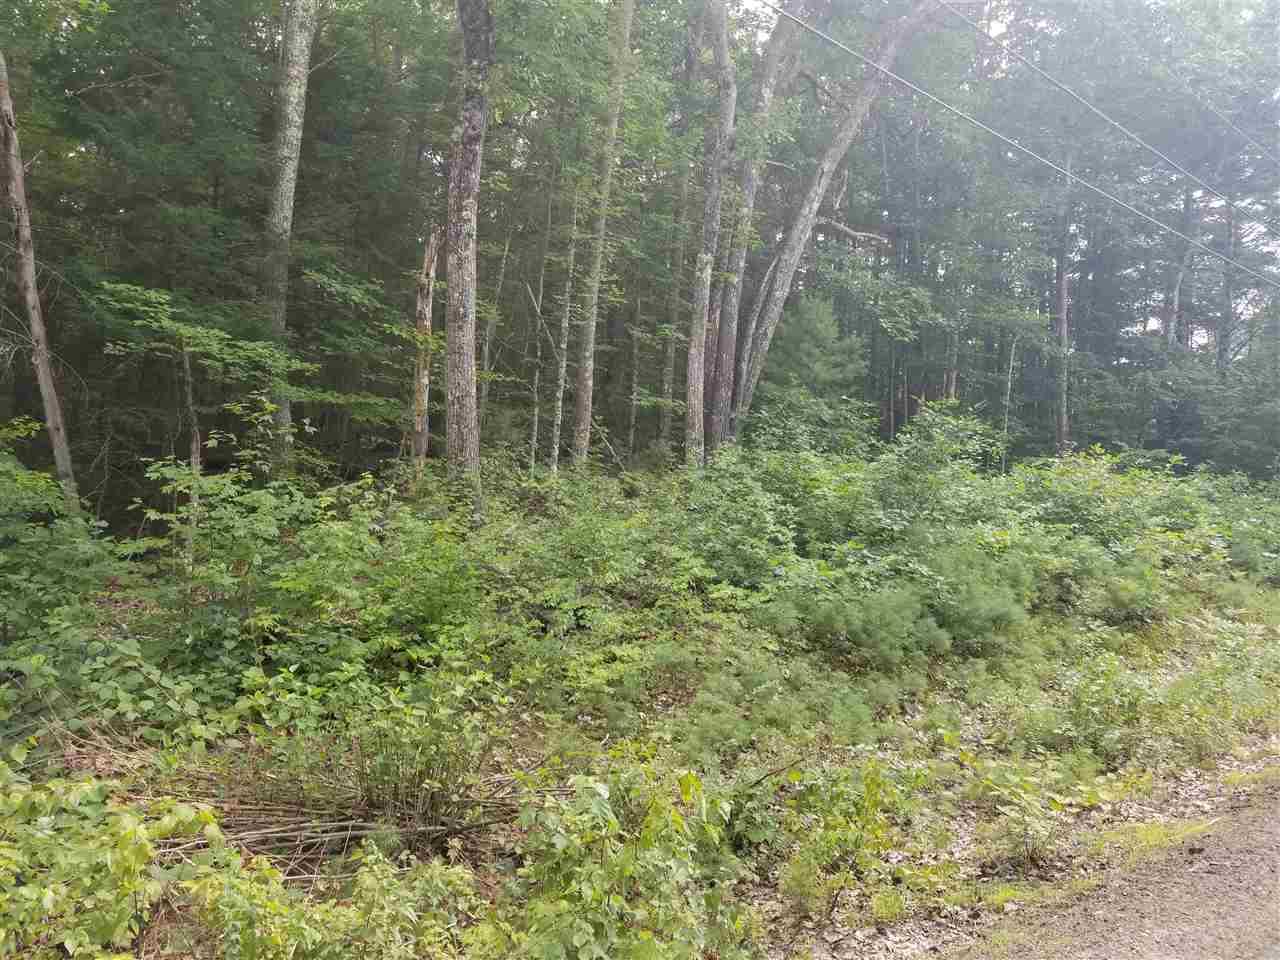 MLS 4723597: 62 Forest Pond, New Hampton NH